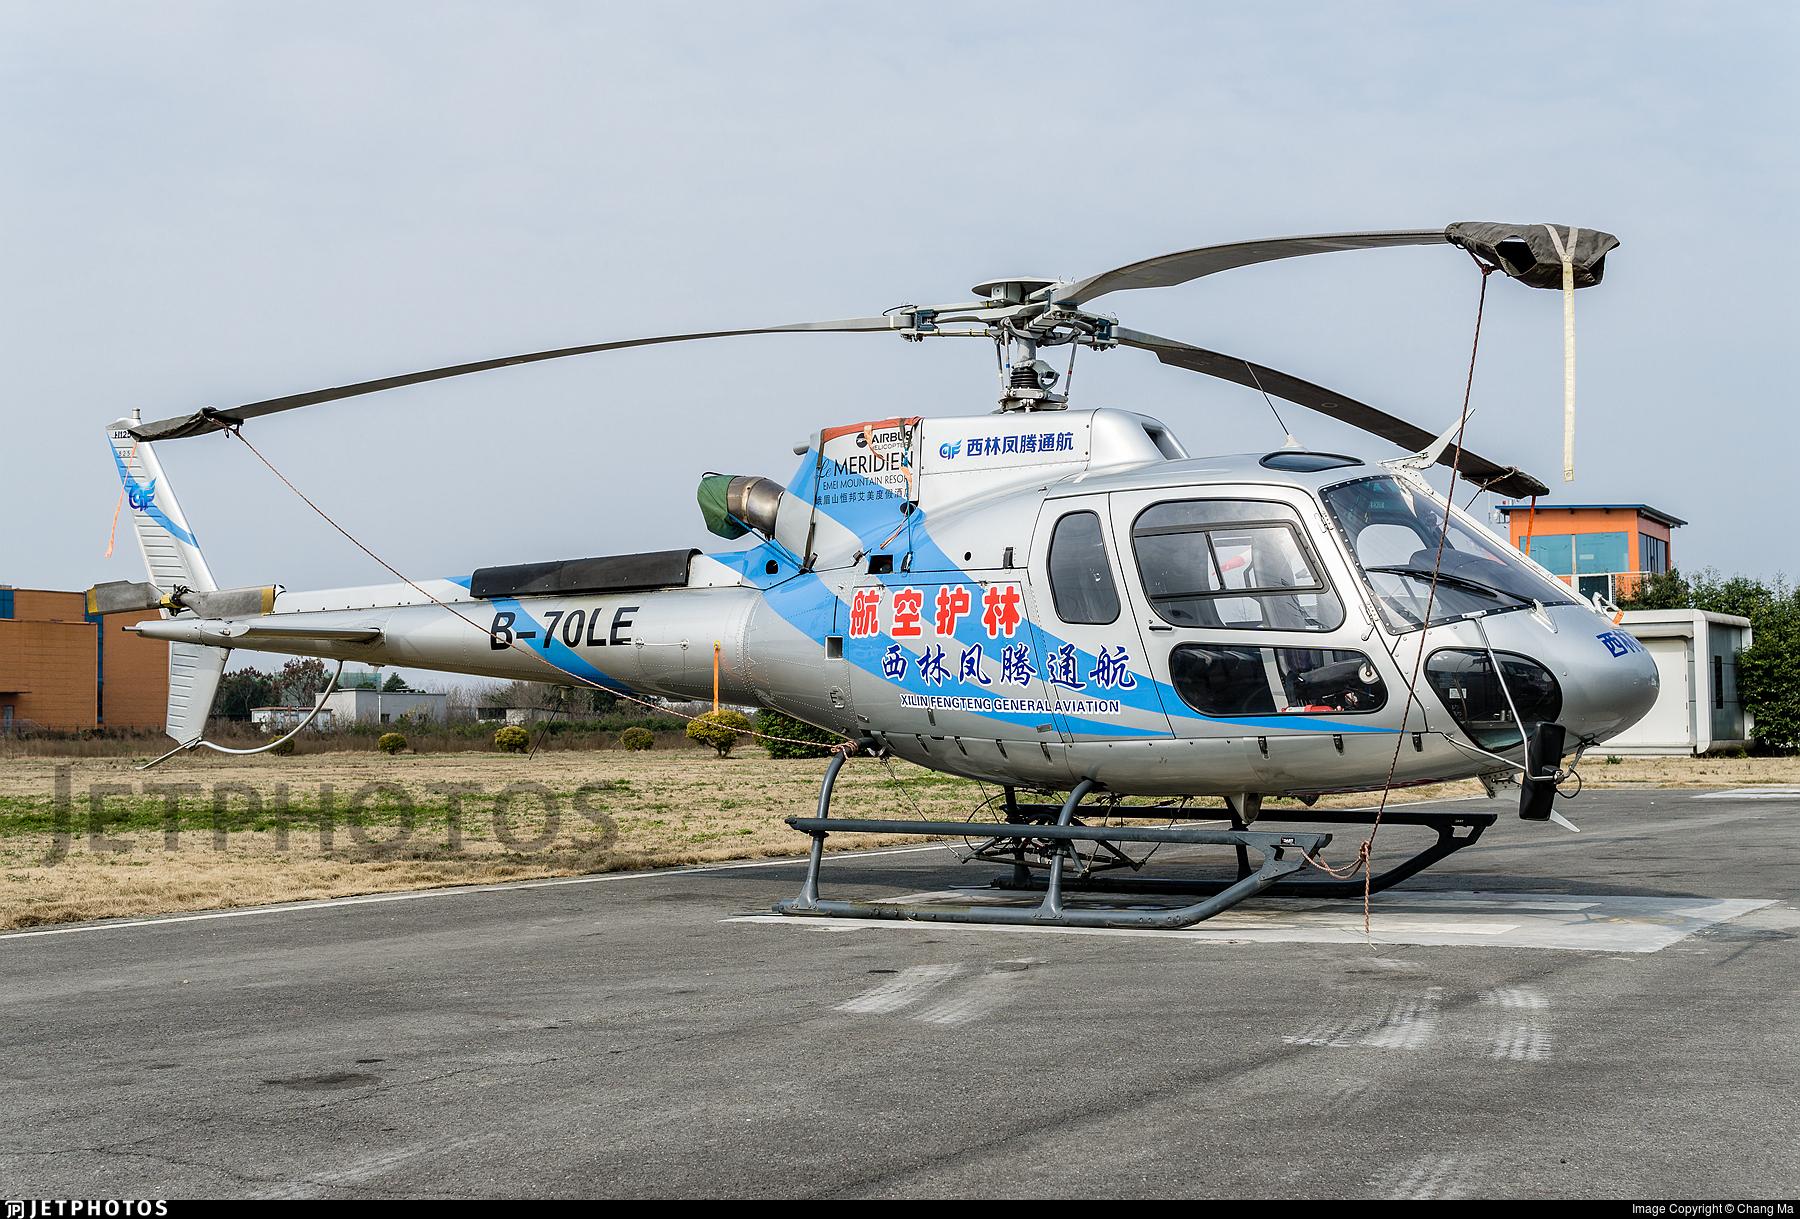 B-70LE - Eurocopter AS 350B3 Ecureuil - Sichuan Xiling Fengteng General Aviation